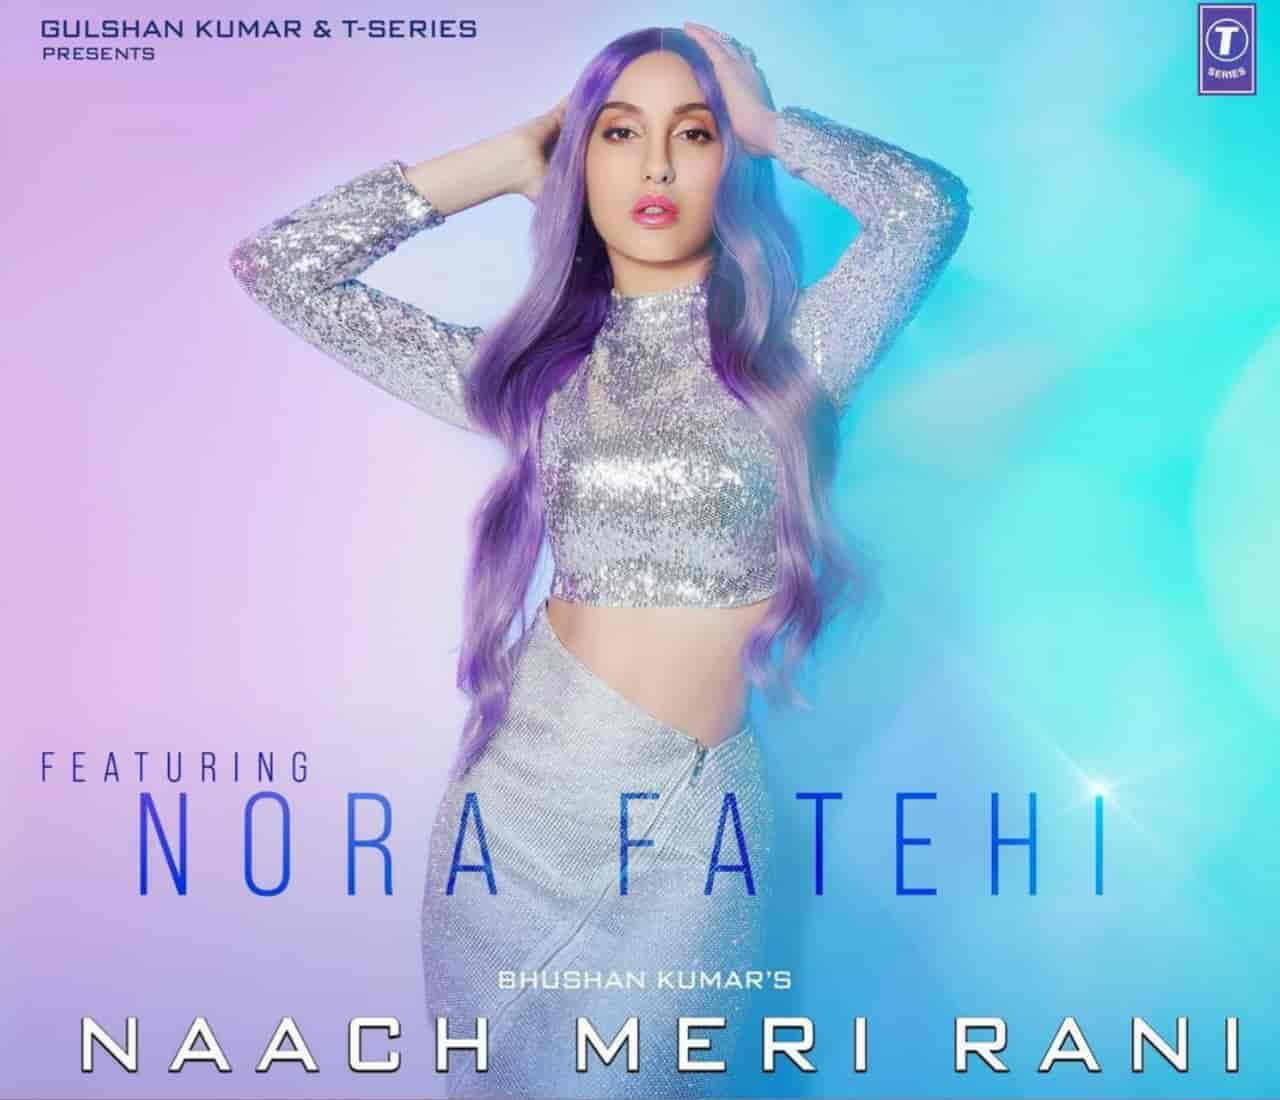 Naach Meri Rani punjabi song lyrics, Sung by Guru Randhawa.